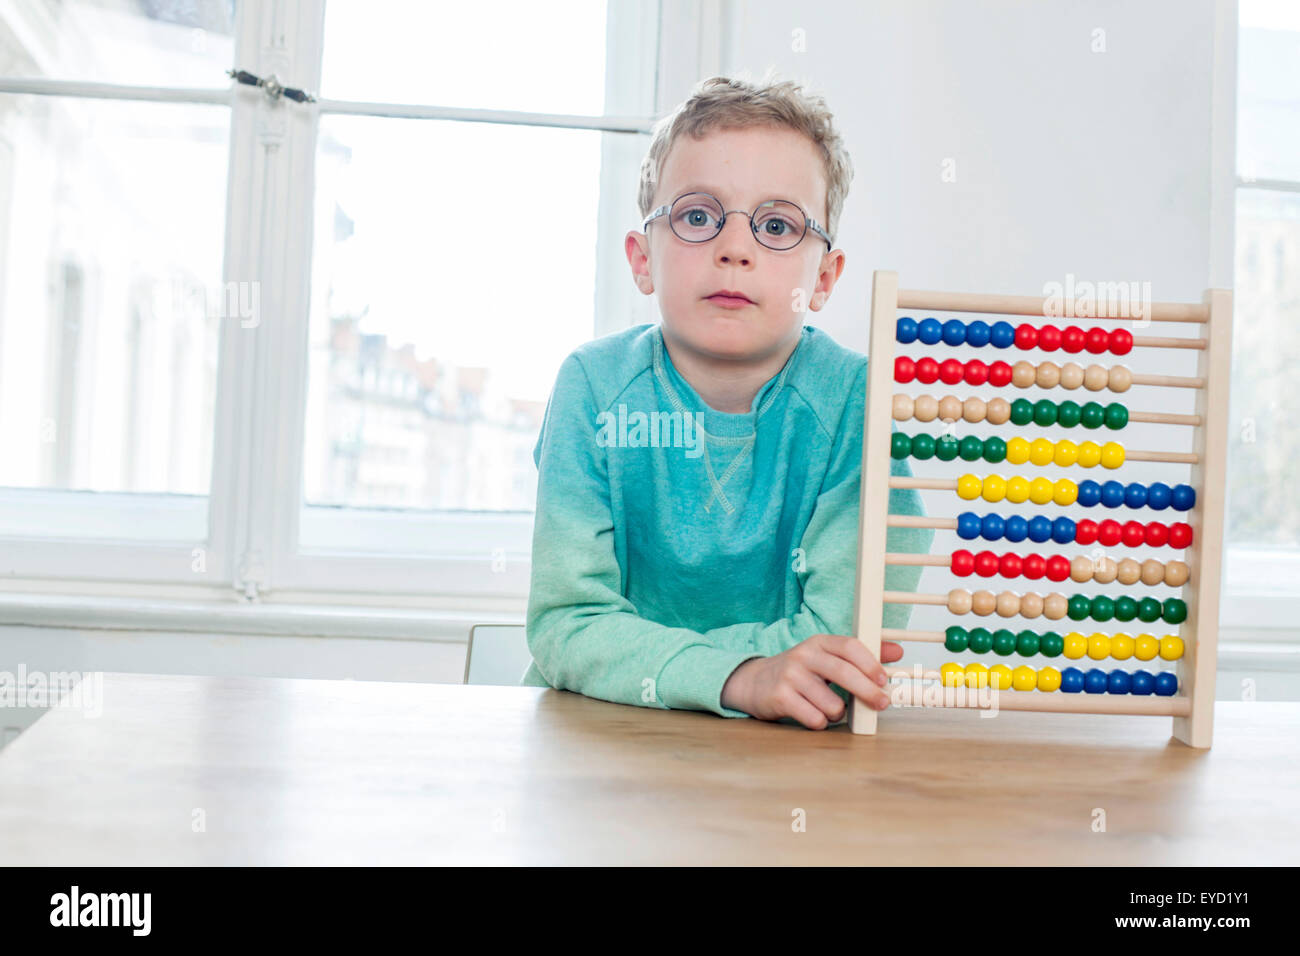 Boy le calcul avec abacus Photo Stock